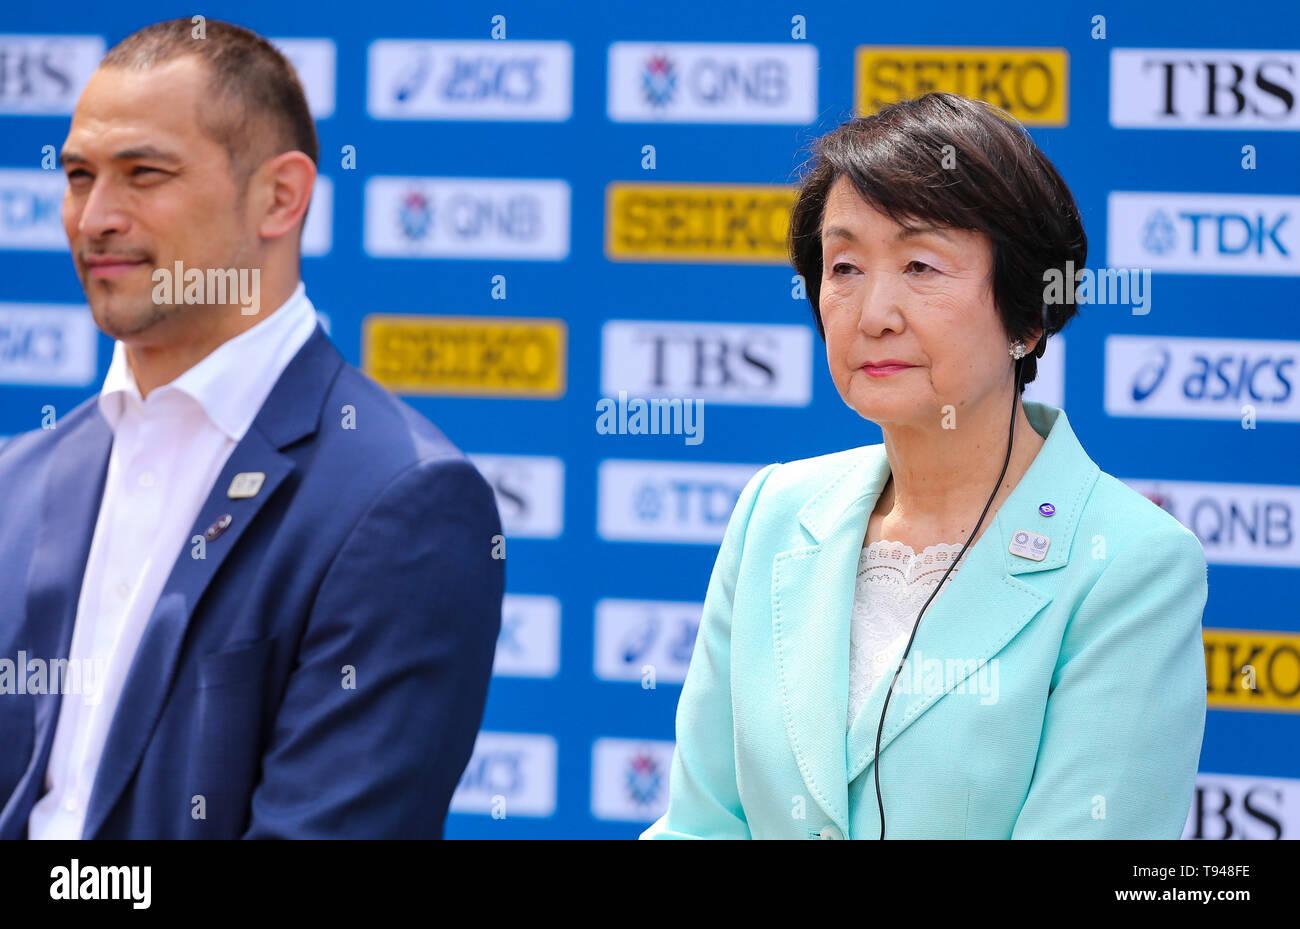 YOKOHAMA, JAPAN - MAY 10: Mayor of Yokohama, Fumiko Hayashi, during the official press conference of the 2019 IAAF World Relay Championships at the Nissan Stadium on May 10, 2019 in Yokohama, Japan. (Photo by Roger Sedres for the IAAF) - Stock Image